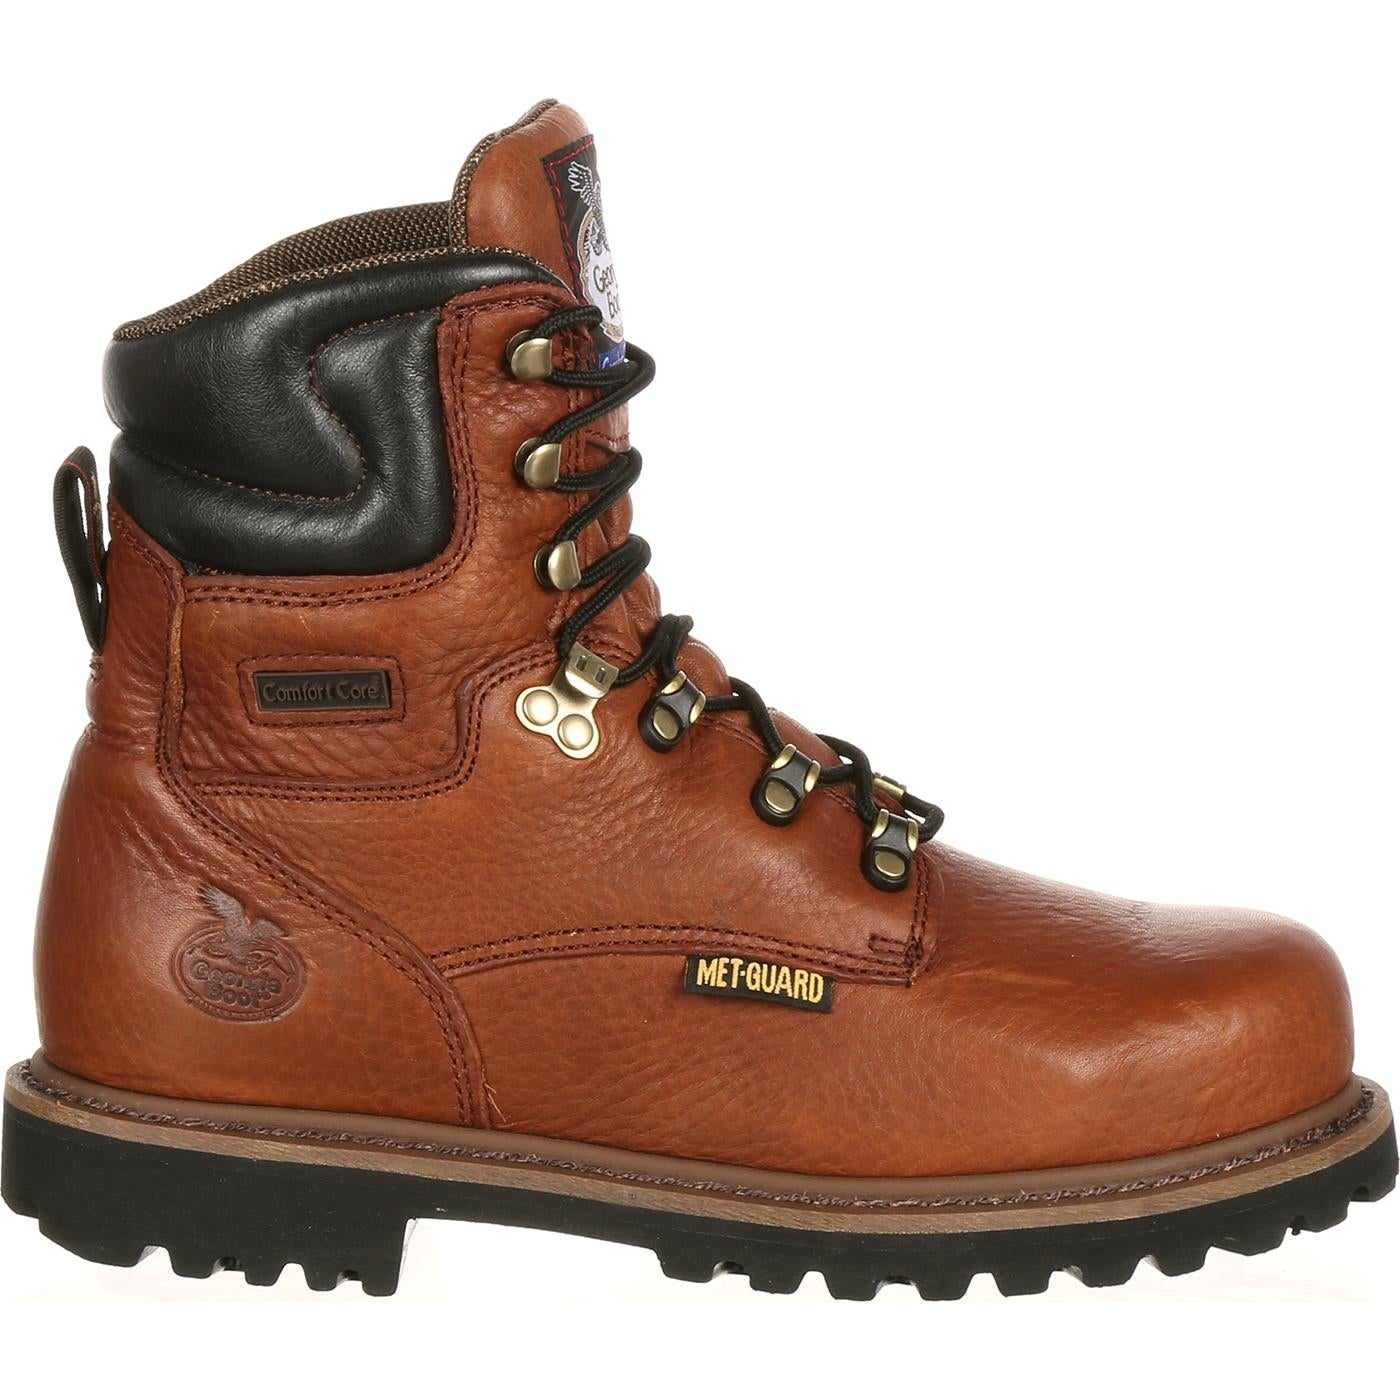 Georgia Boot Drill Dog Steel Toe Metatarsal Work Boot Black and Brown